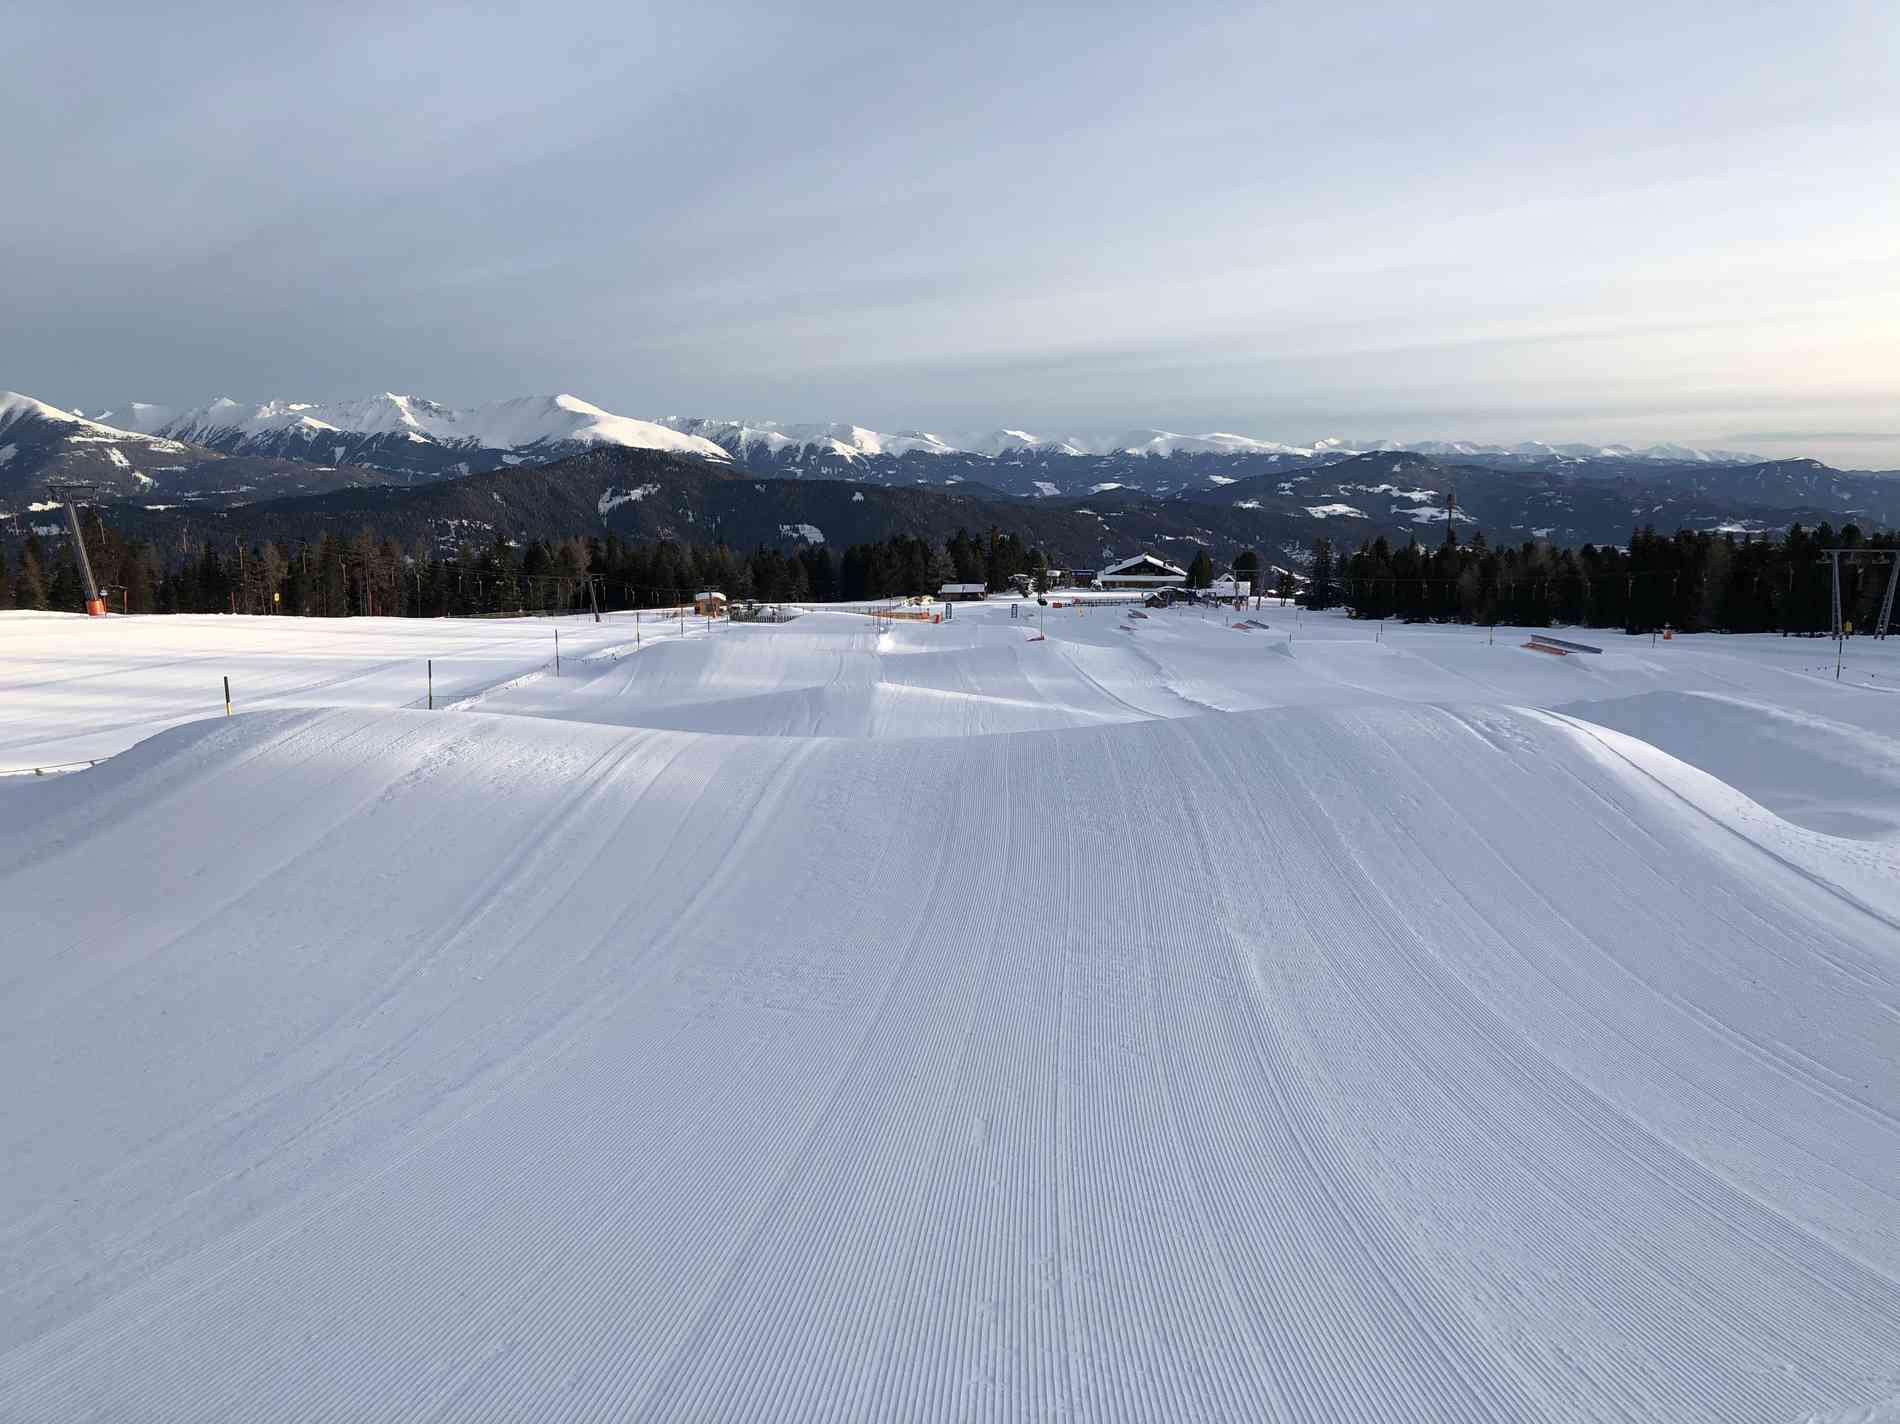 Fun Pipe Area Schnee-Elemente Banked Run